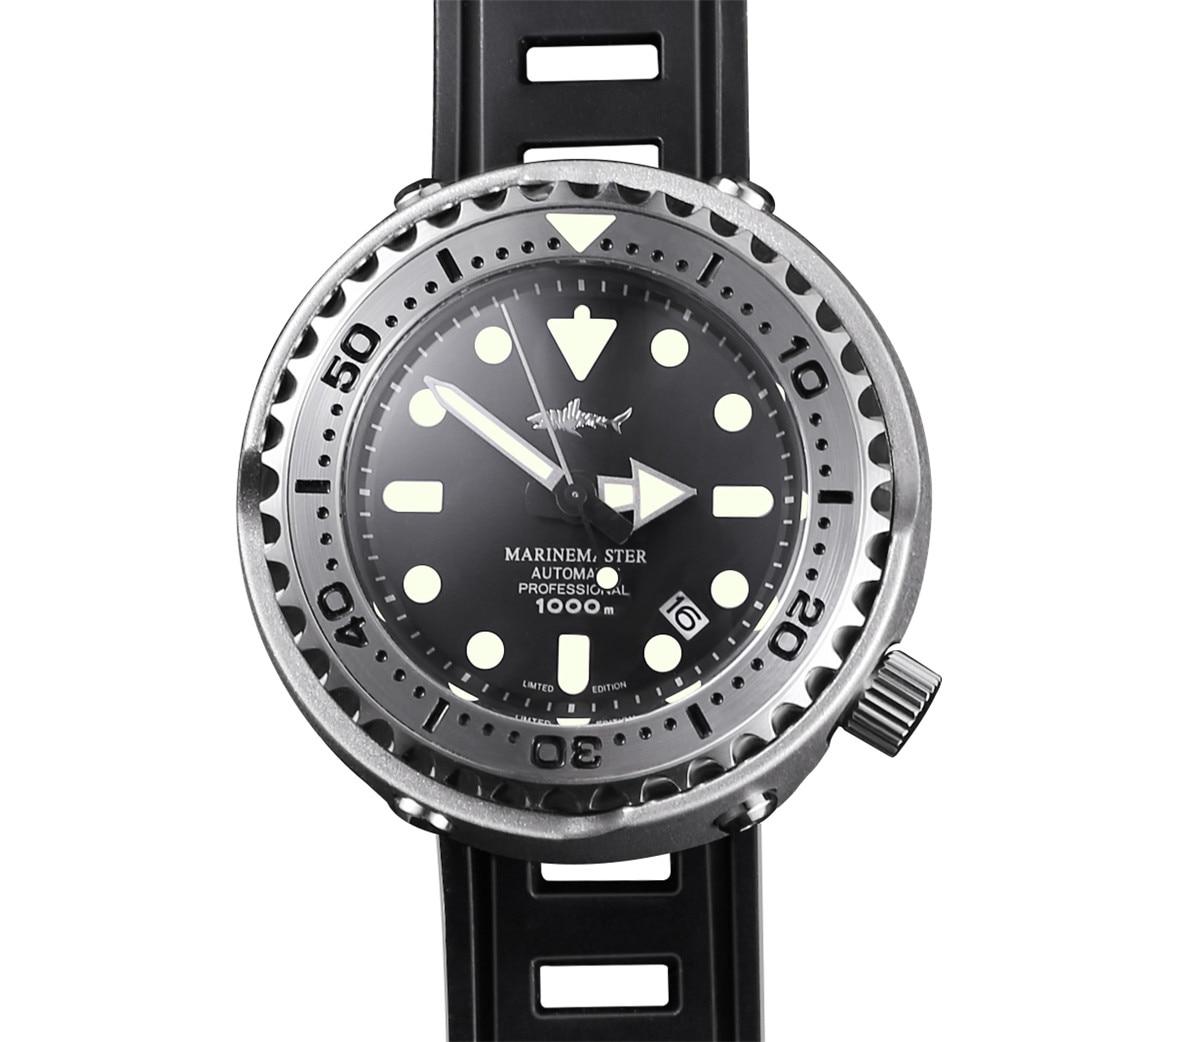 Relojes Monoblock con lata de atún japonés, reloj Sharke Sharkey, reloj automático de buceo para hombre, reloj Vinatge de 1000ATM